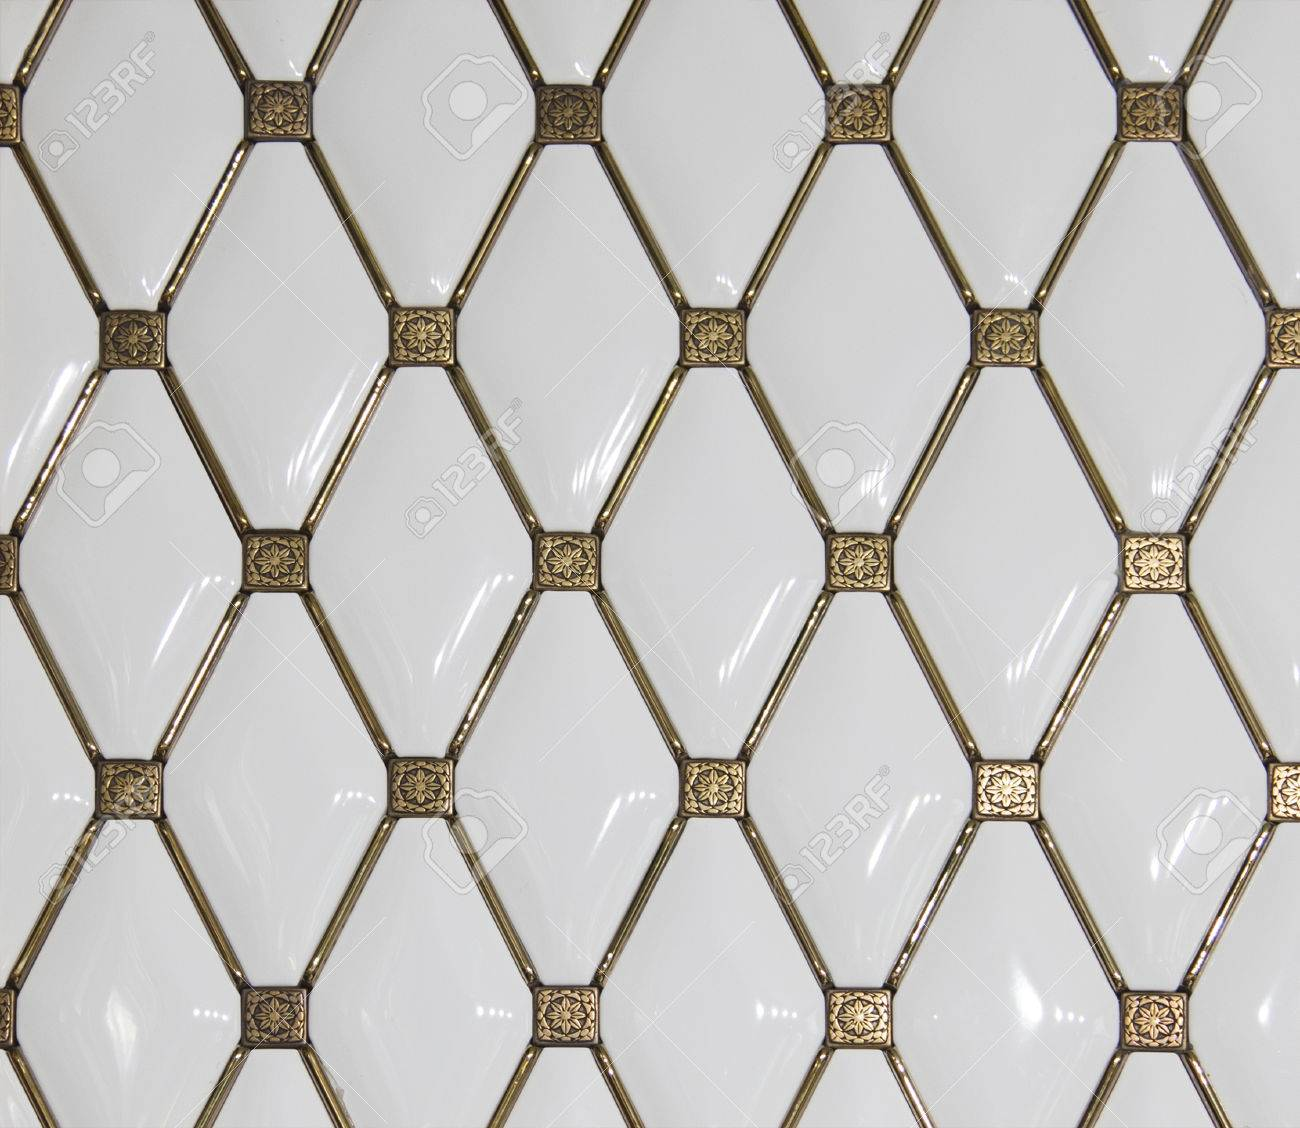 The actual texture of ceramic tiles